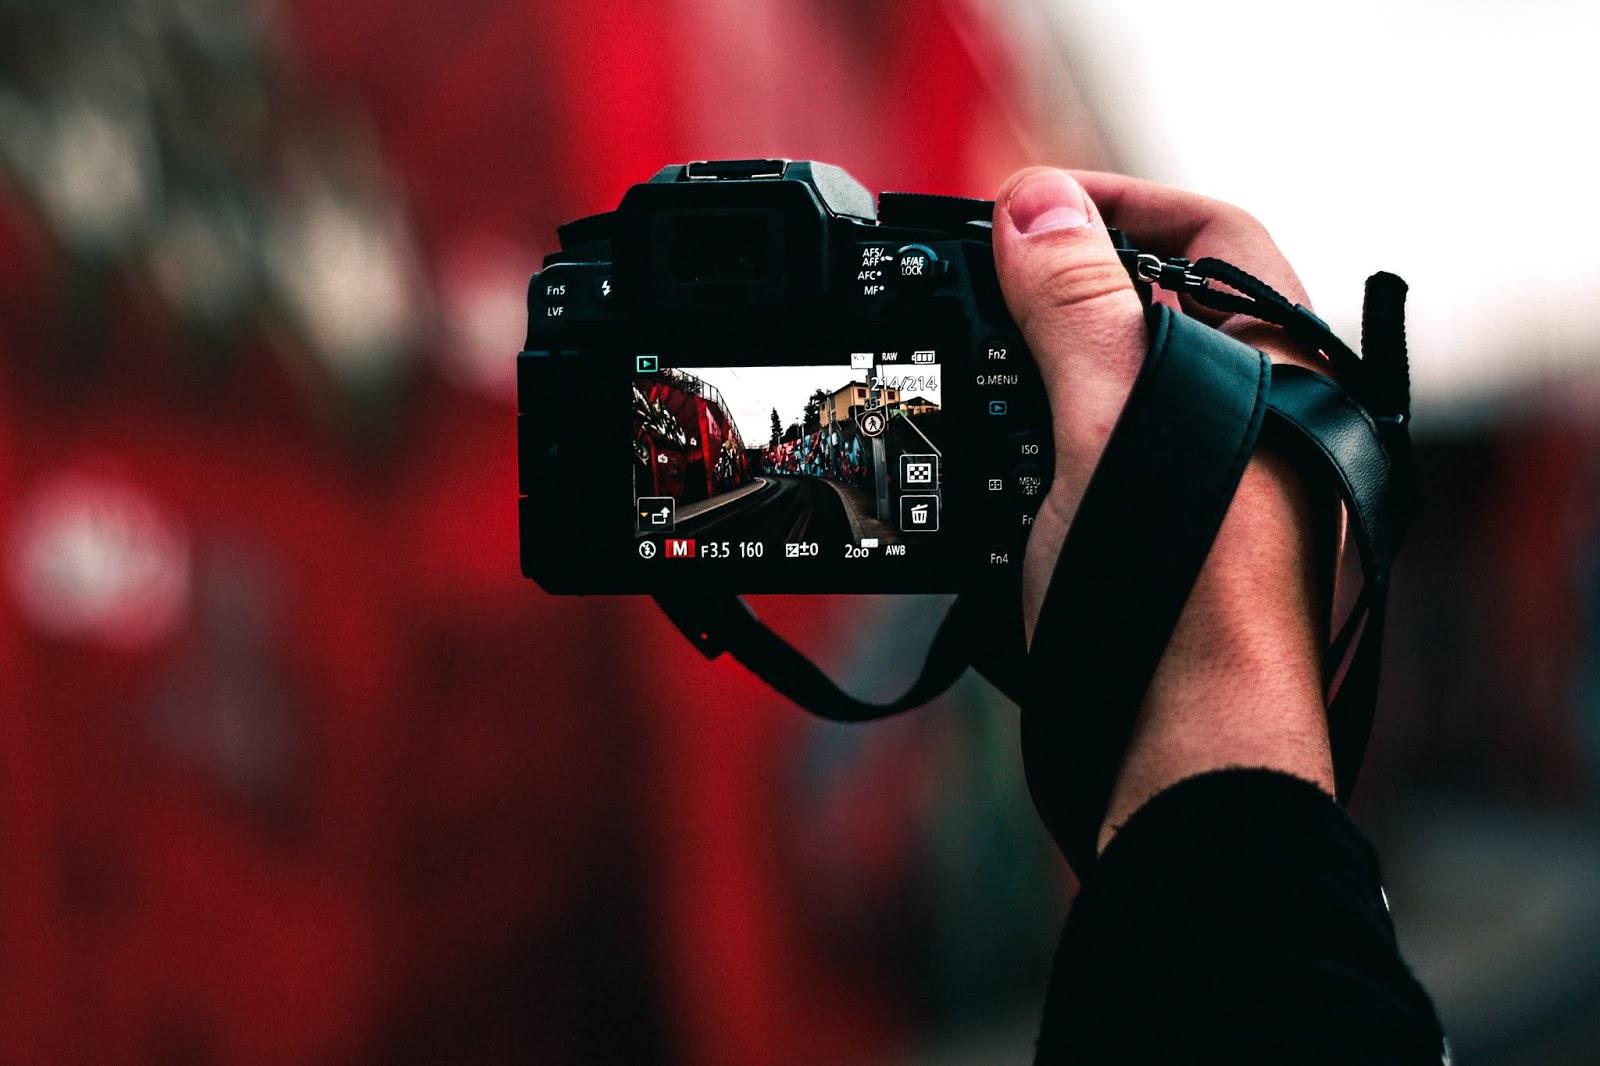 menjadi fotografer tidak butuh kuliah jurusan fotografi